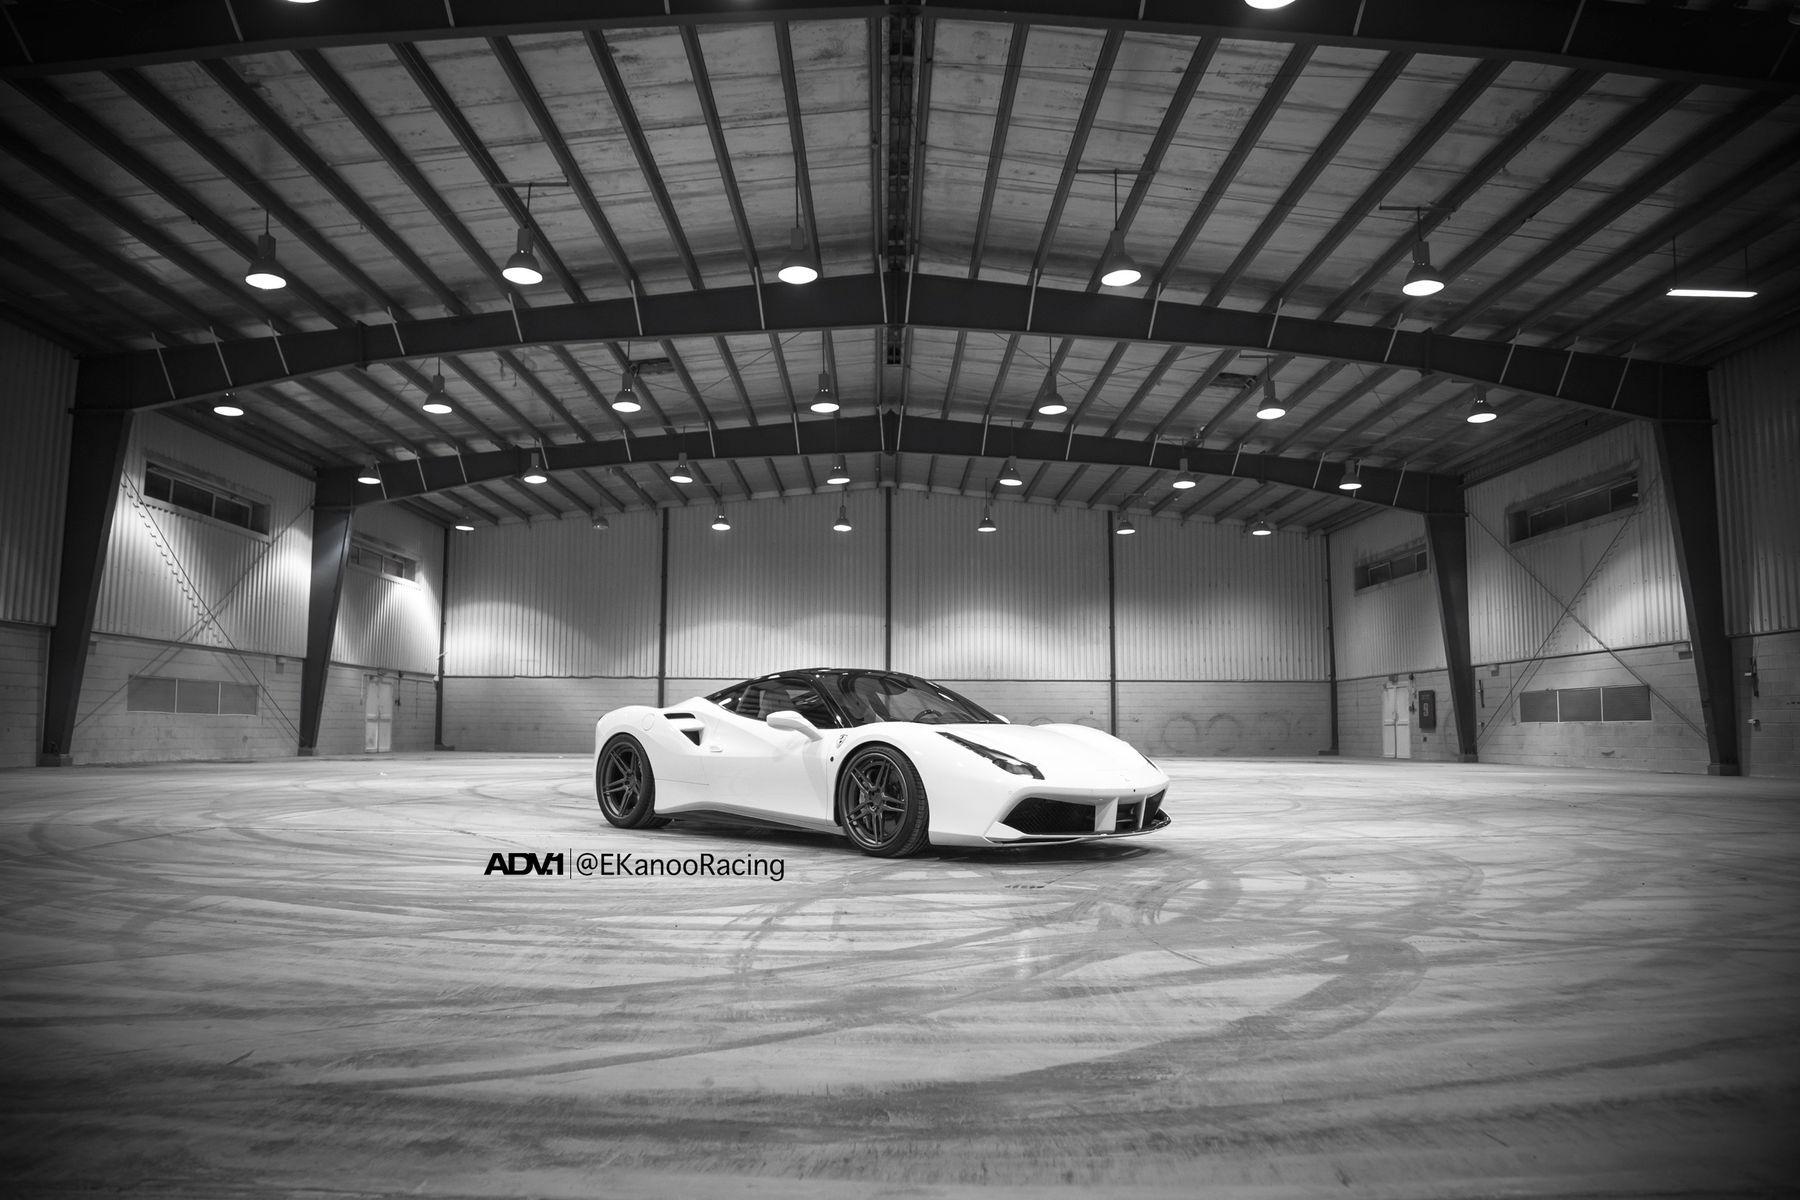 Ferrari 488 GTB | ADV.1 Ferrari 488 GTB